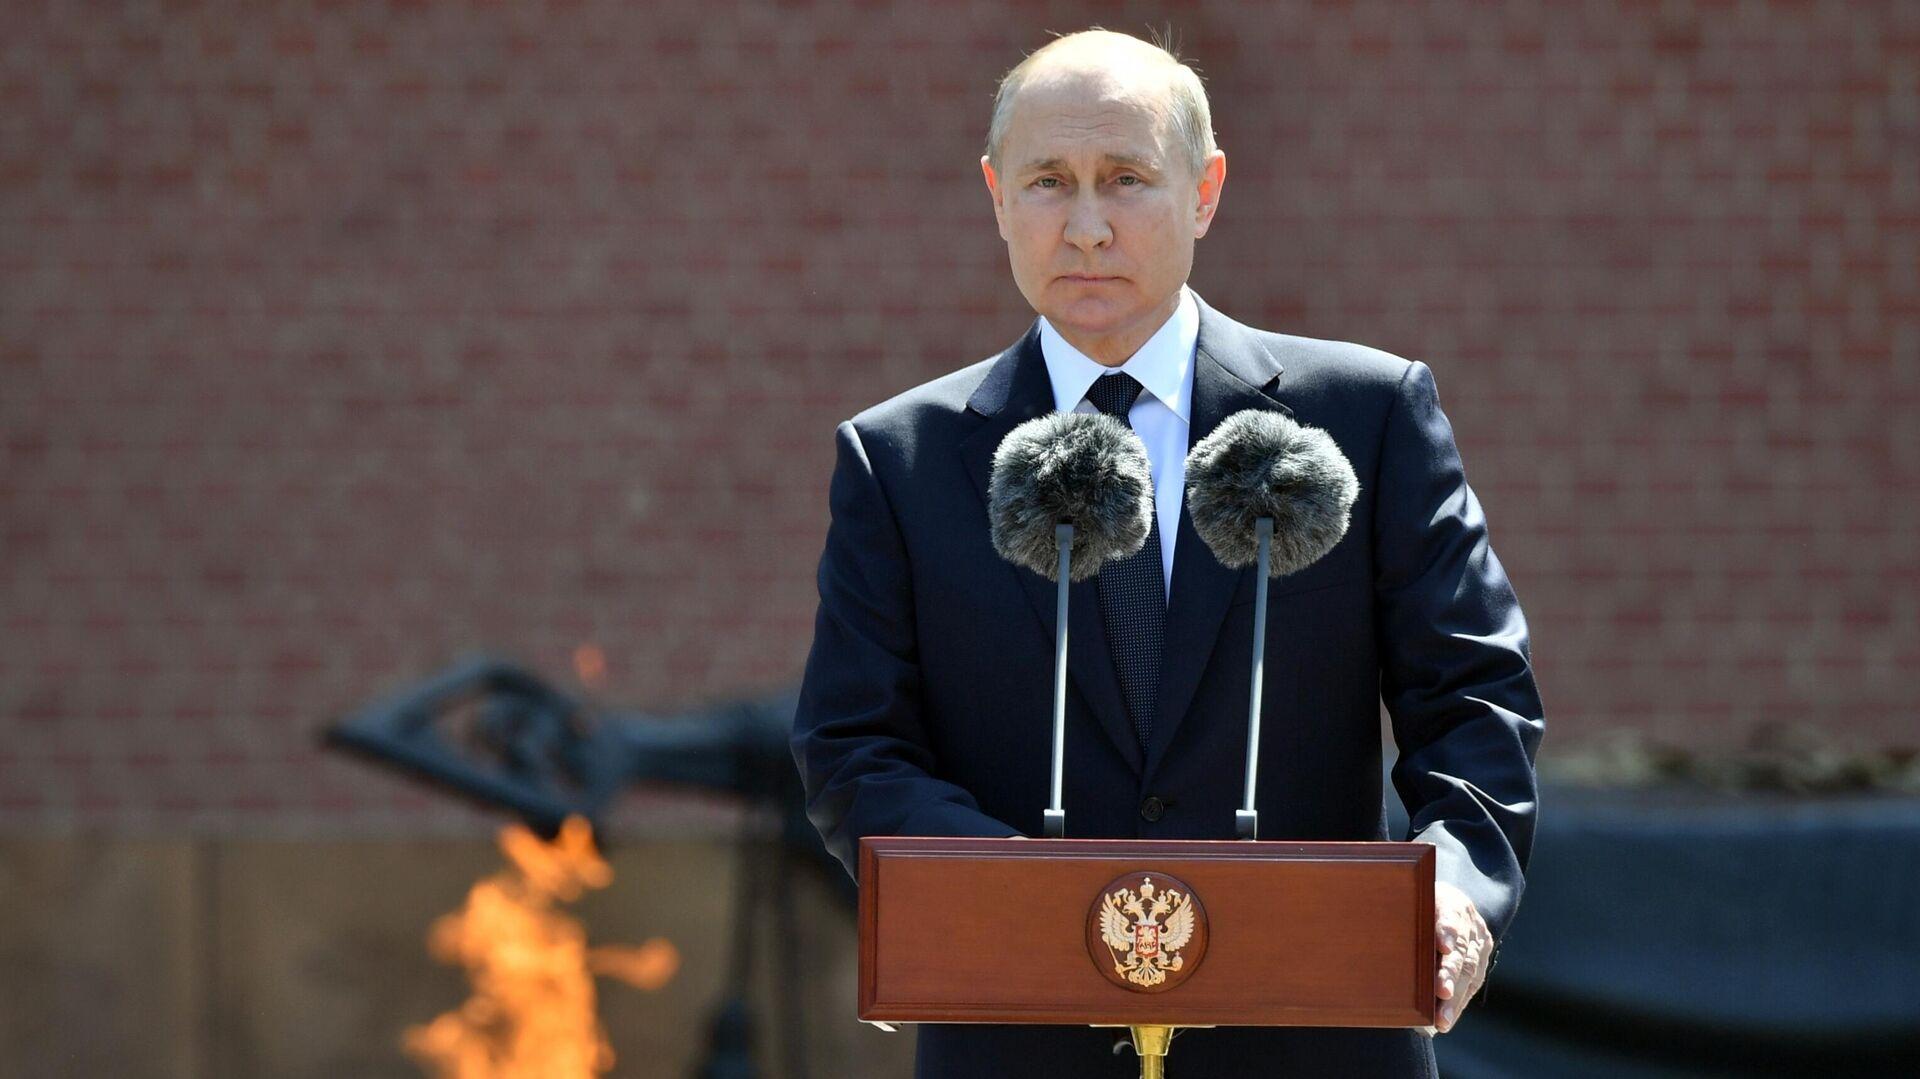 Президент РФ В. Путин принял участие в церемонии возложения венков к Могиле Неизвестного Солдата - Sputnik Таджикистан, 1920, 22.06.2021